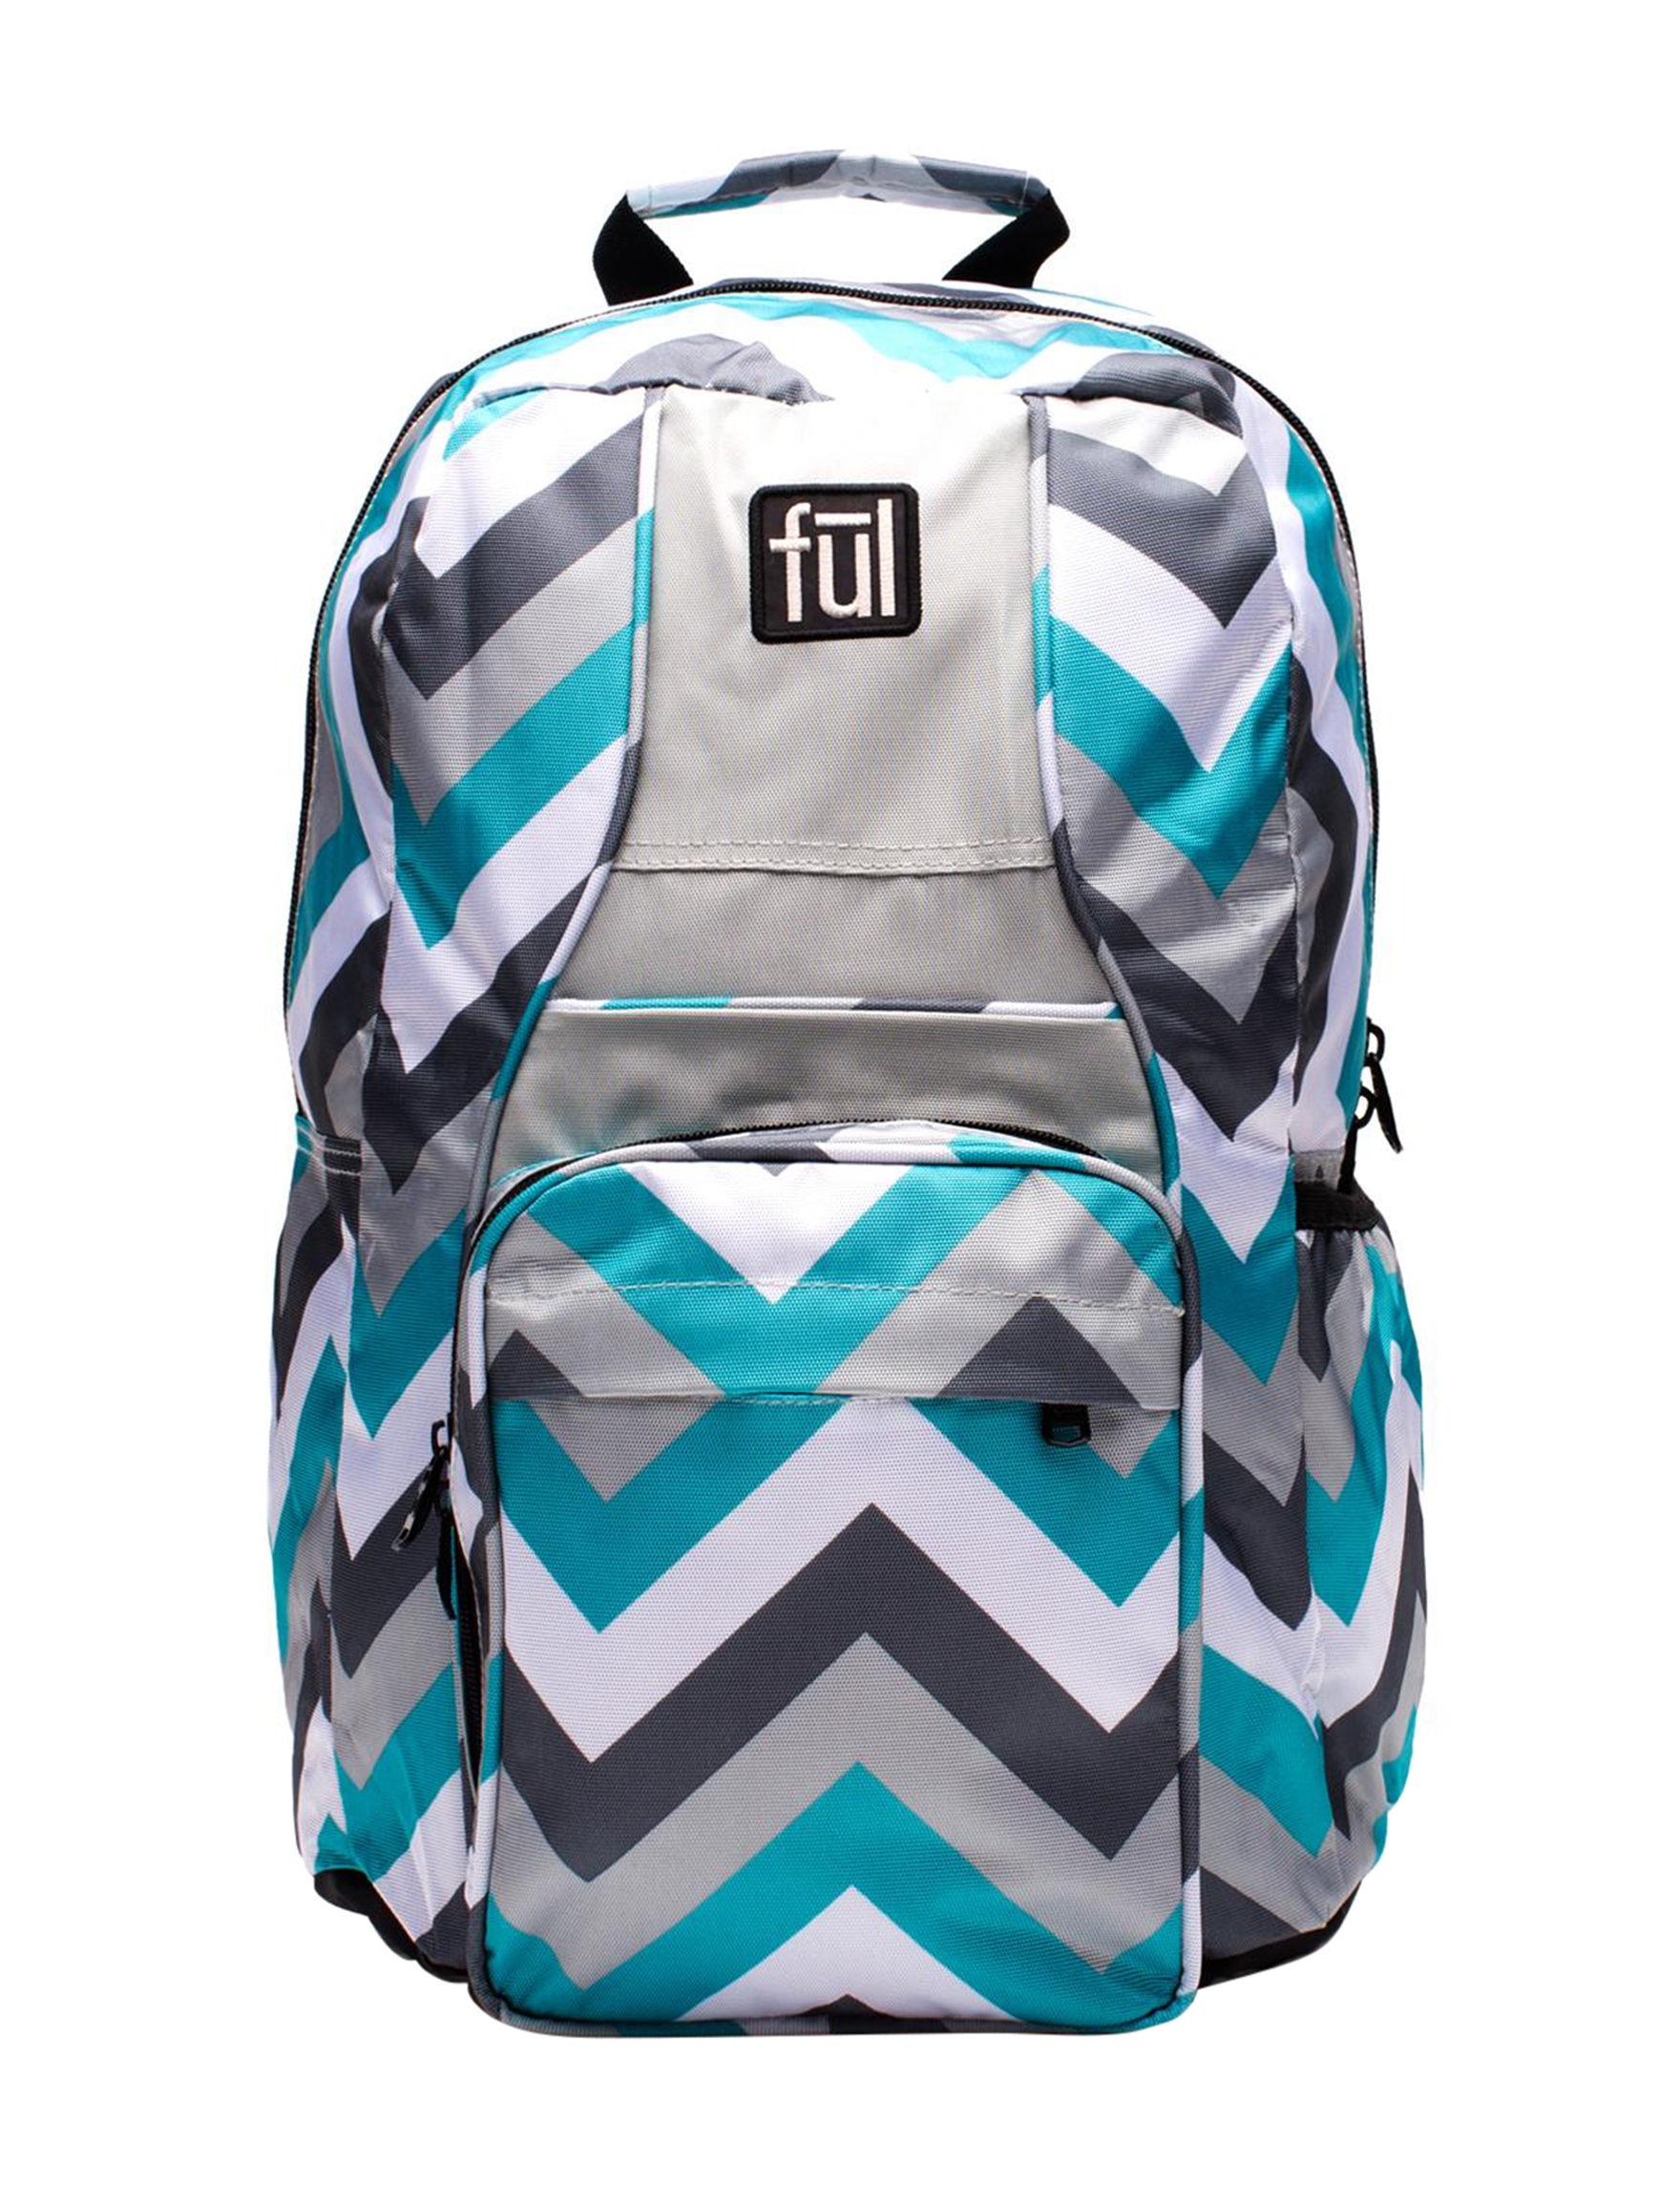 Ful Blue Multi Bookbags & Backpacks